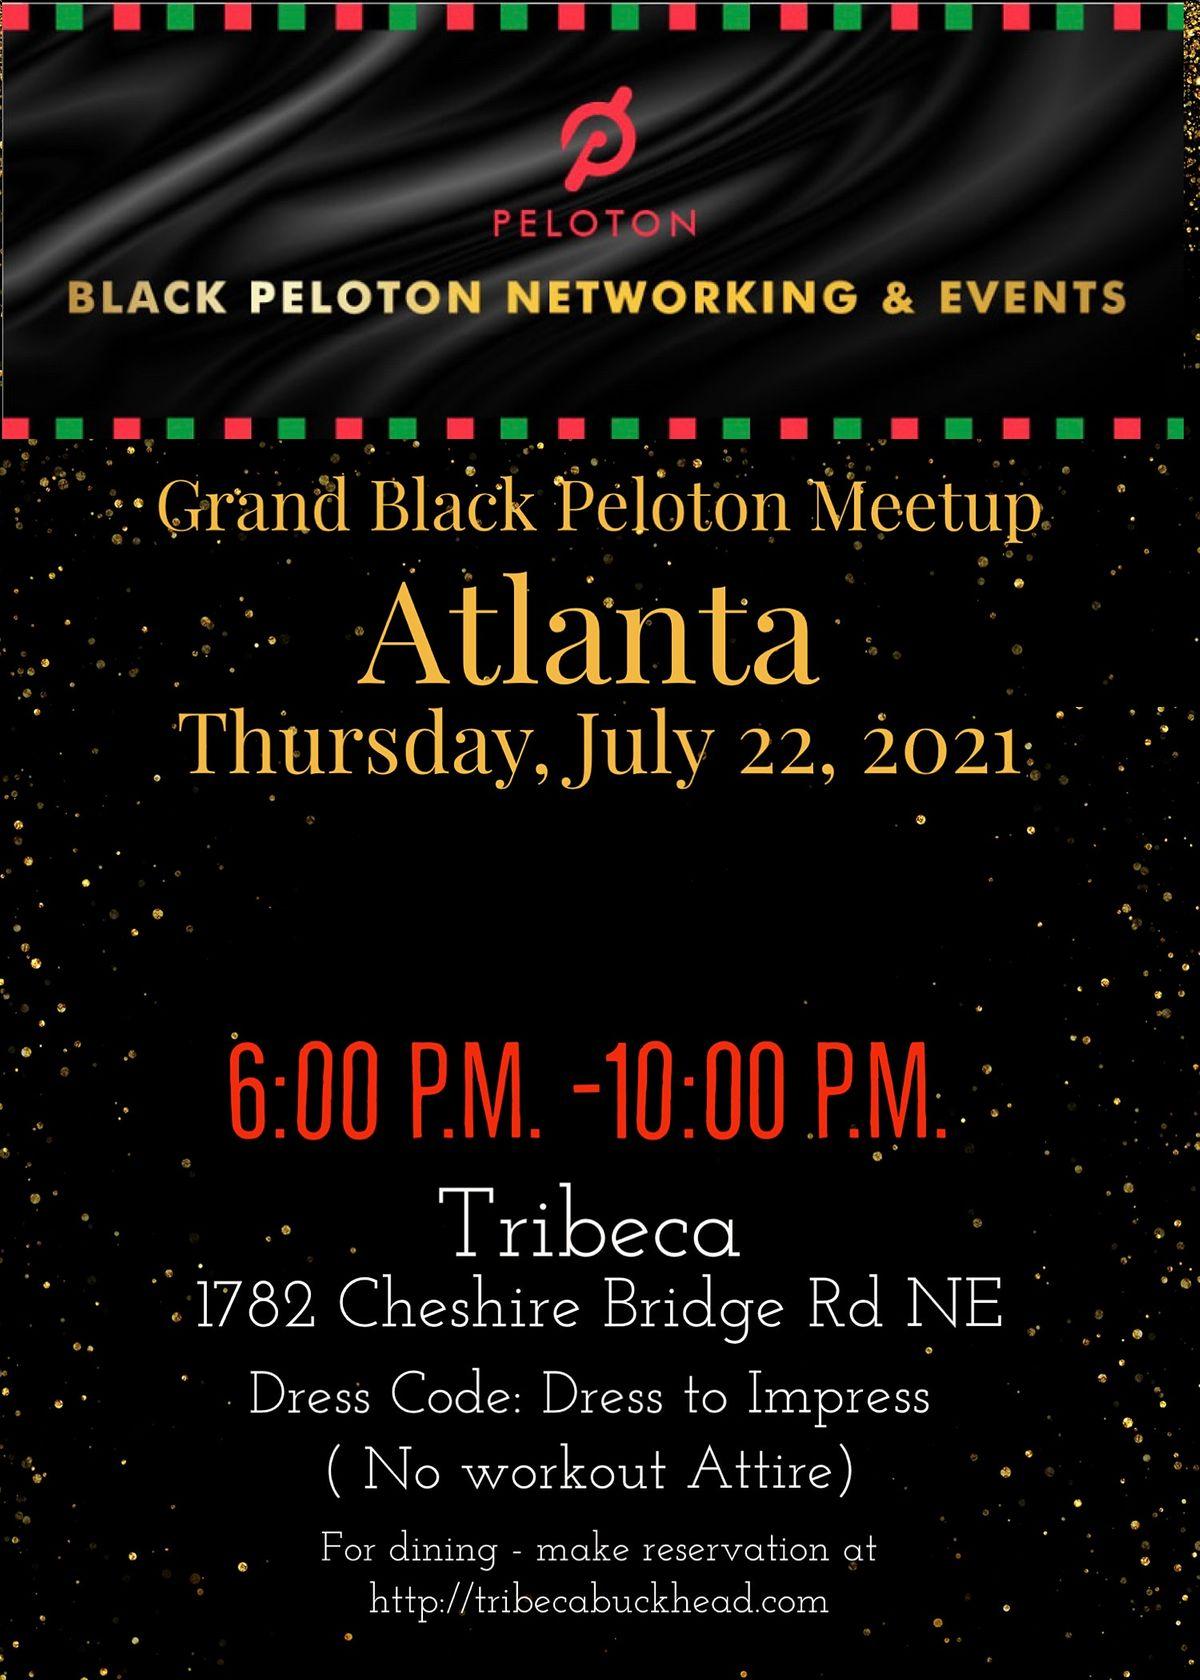 The Grand Black Peloton Meetup -ATLANTA